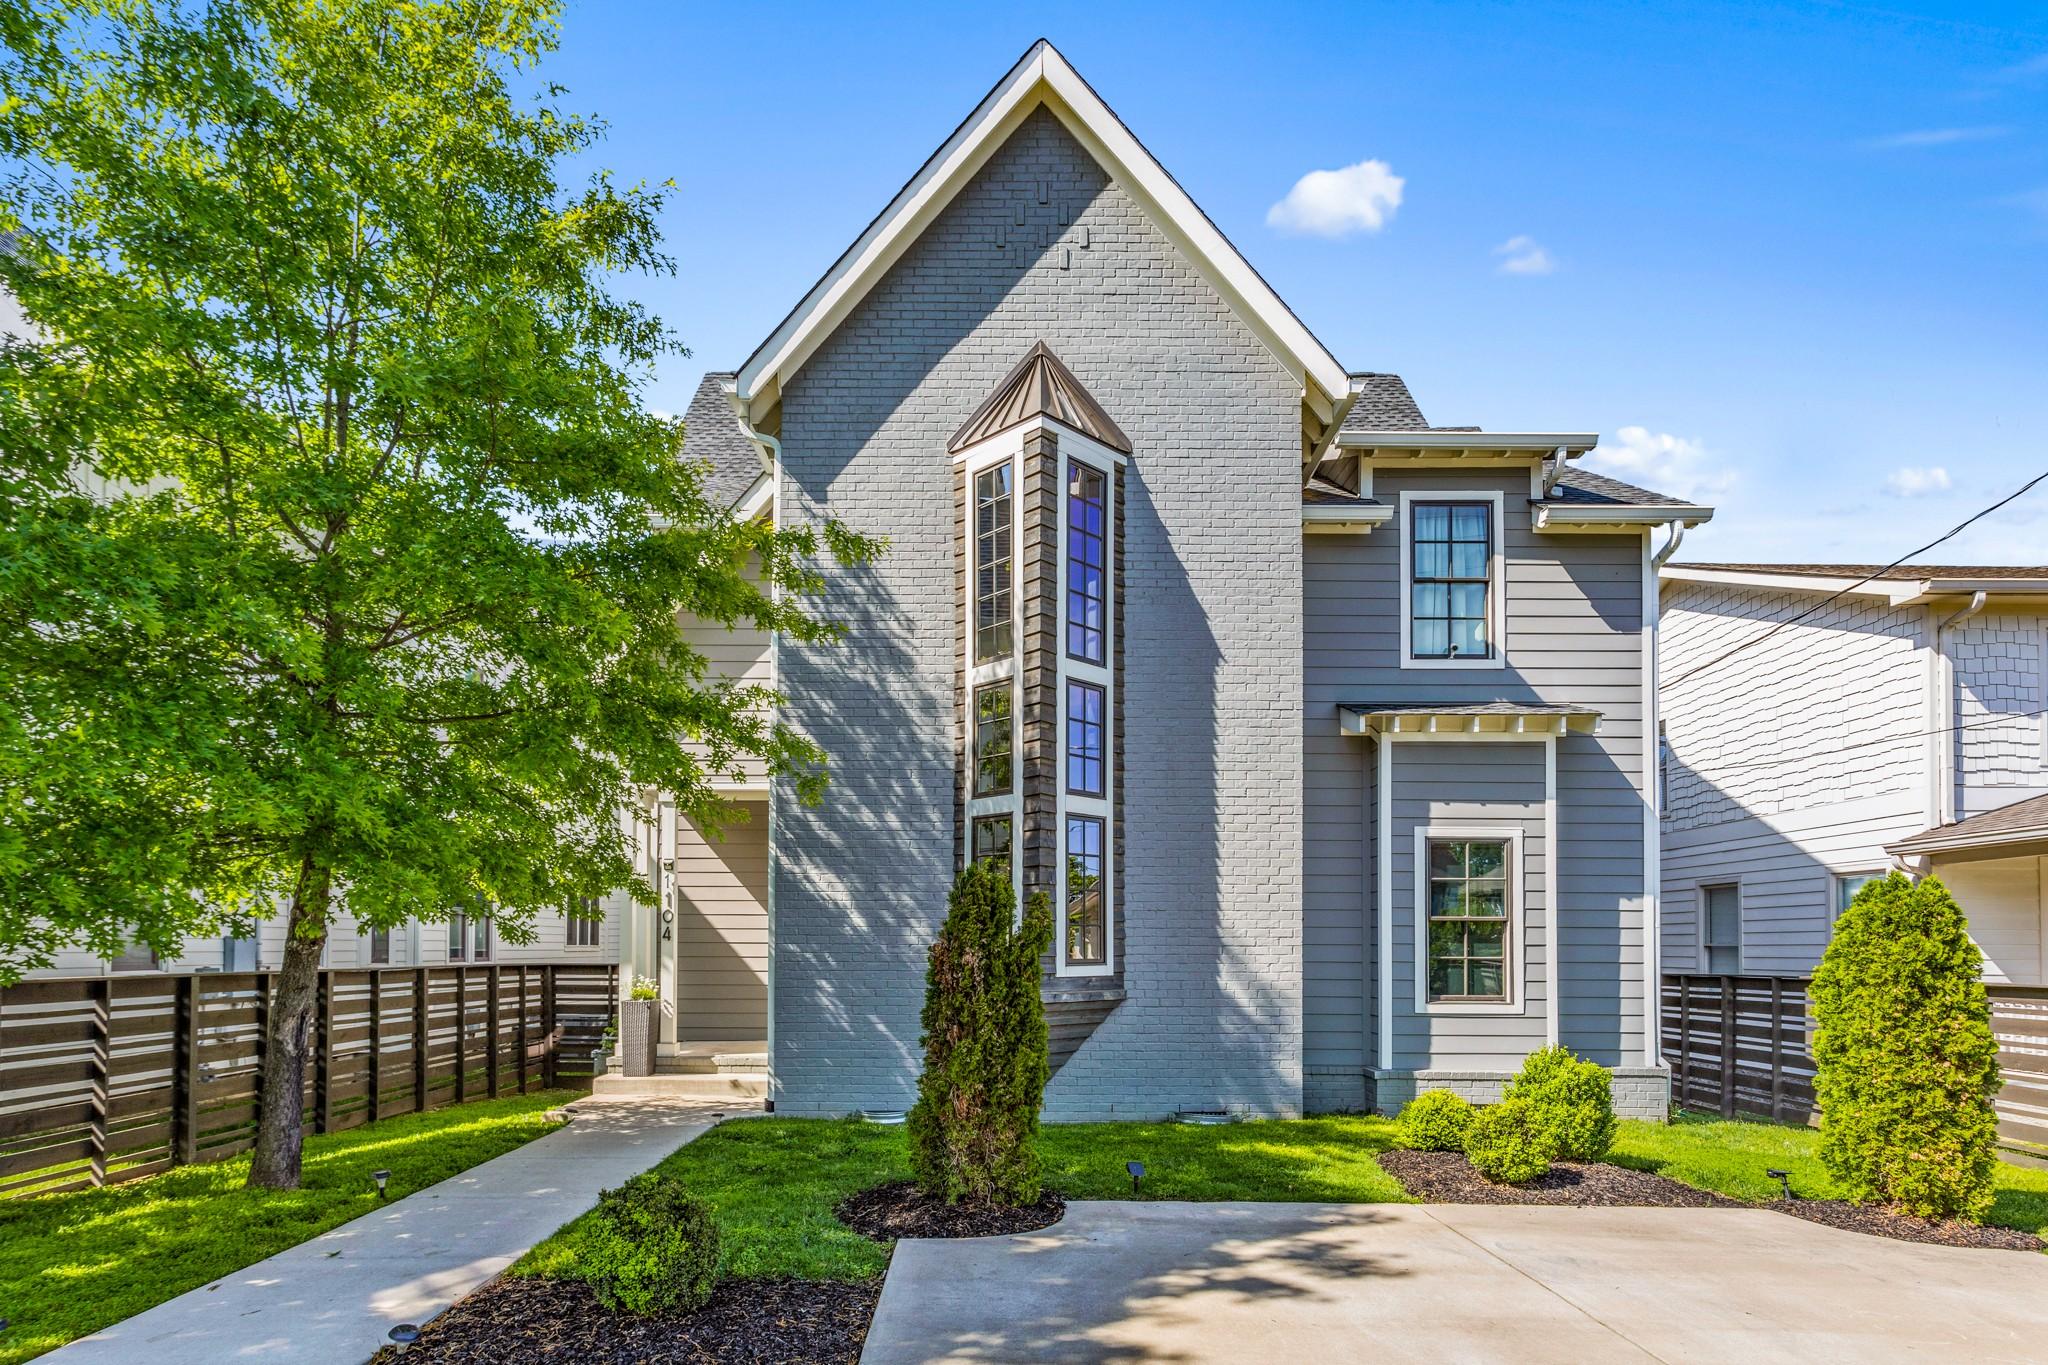 1104 Caldwell Ave, Nashville, TN 37204 - Nashville, TN real estate listing